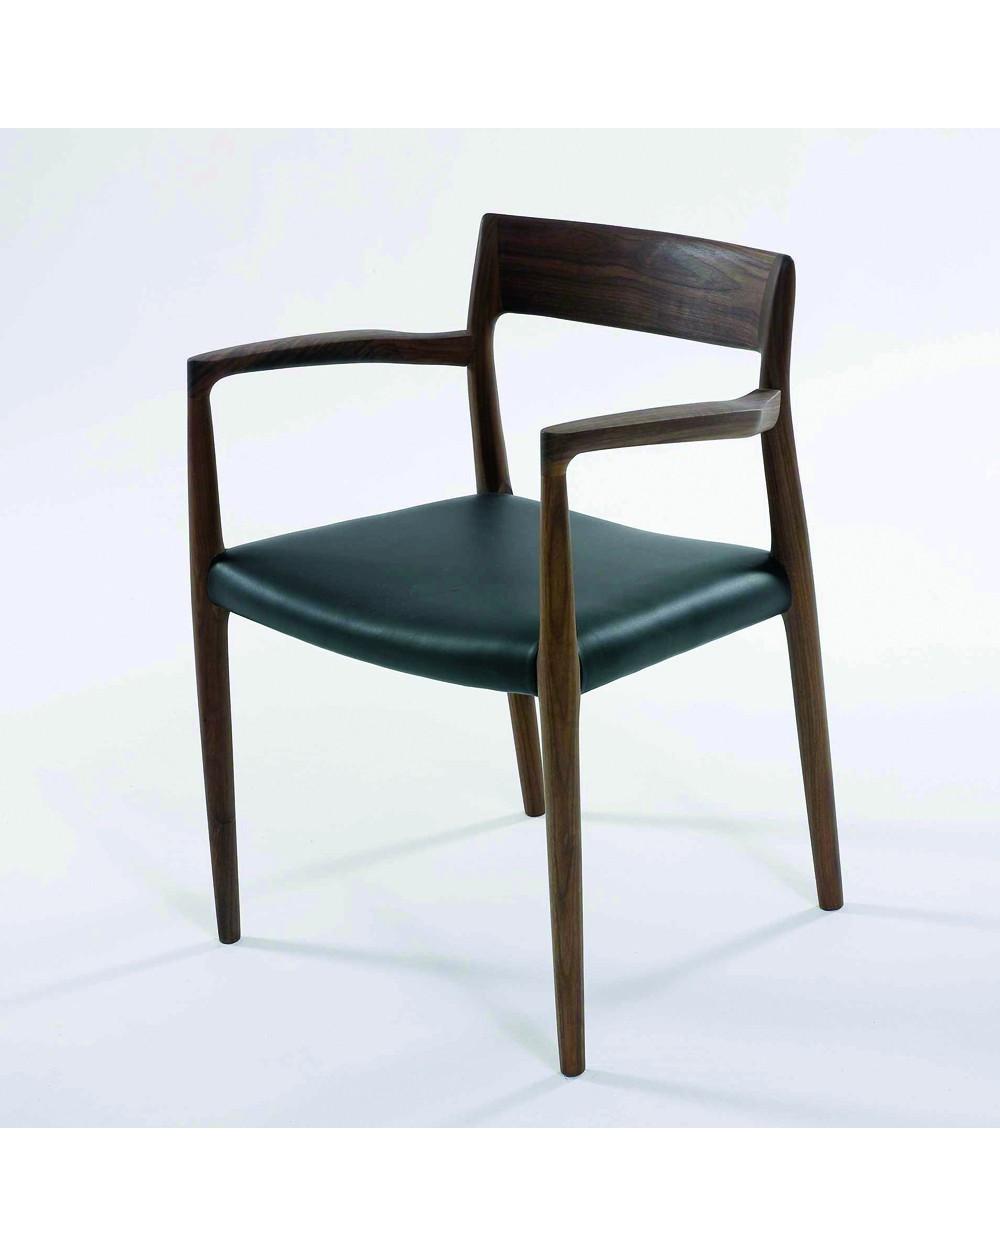 Mollers 57 armchair, N.O Mollers design